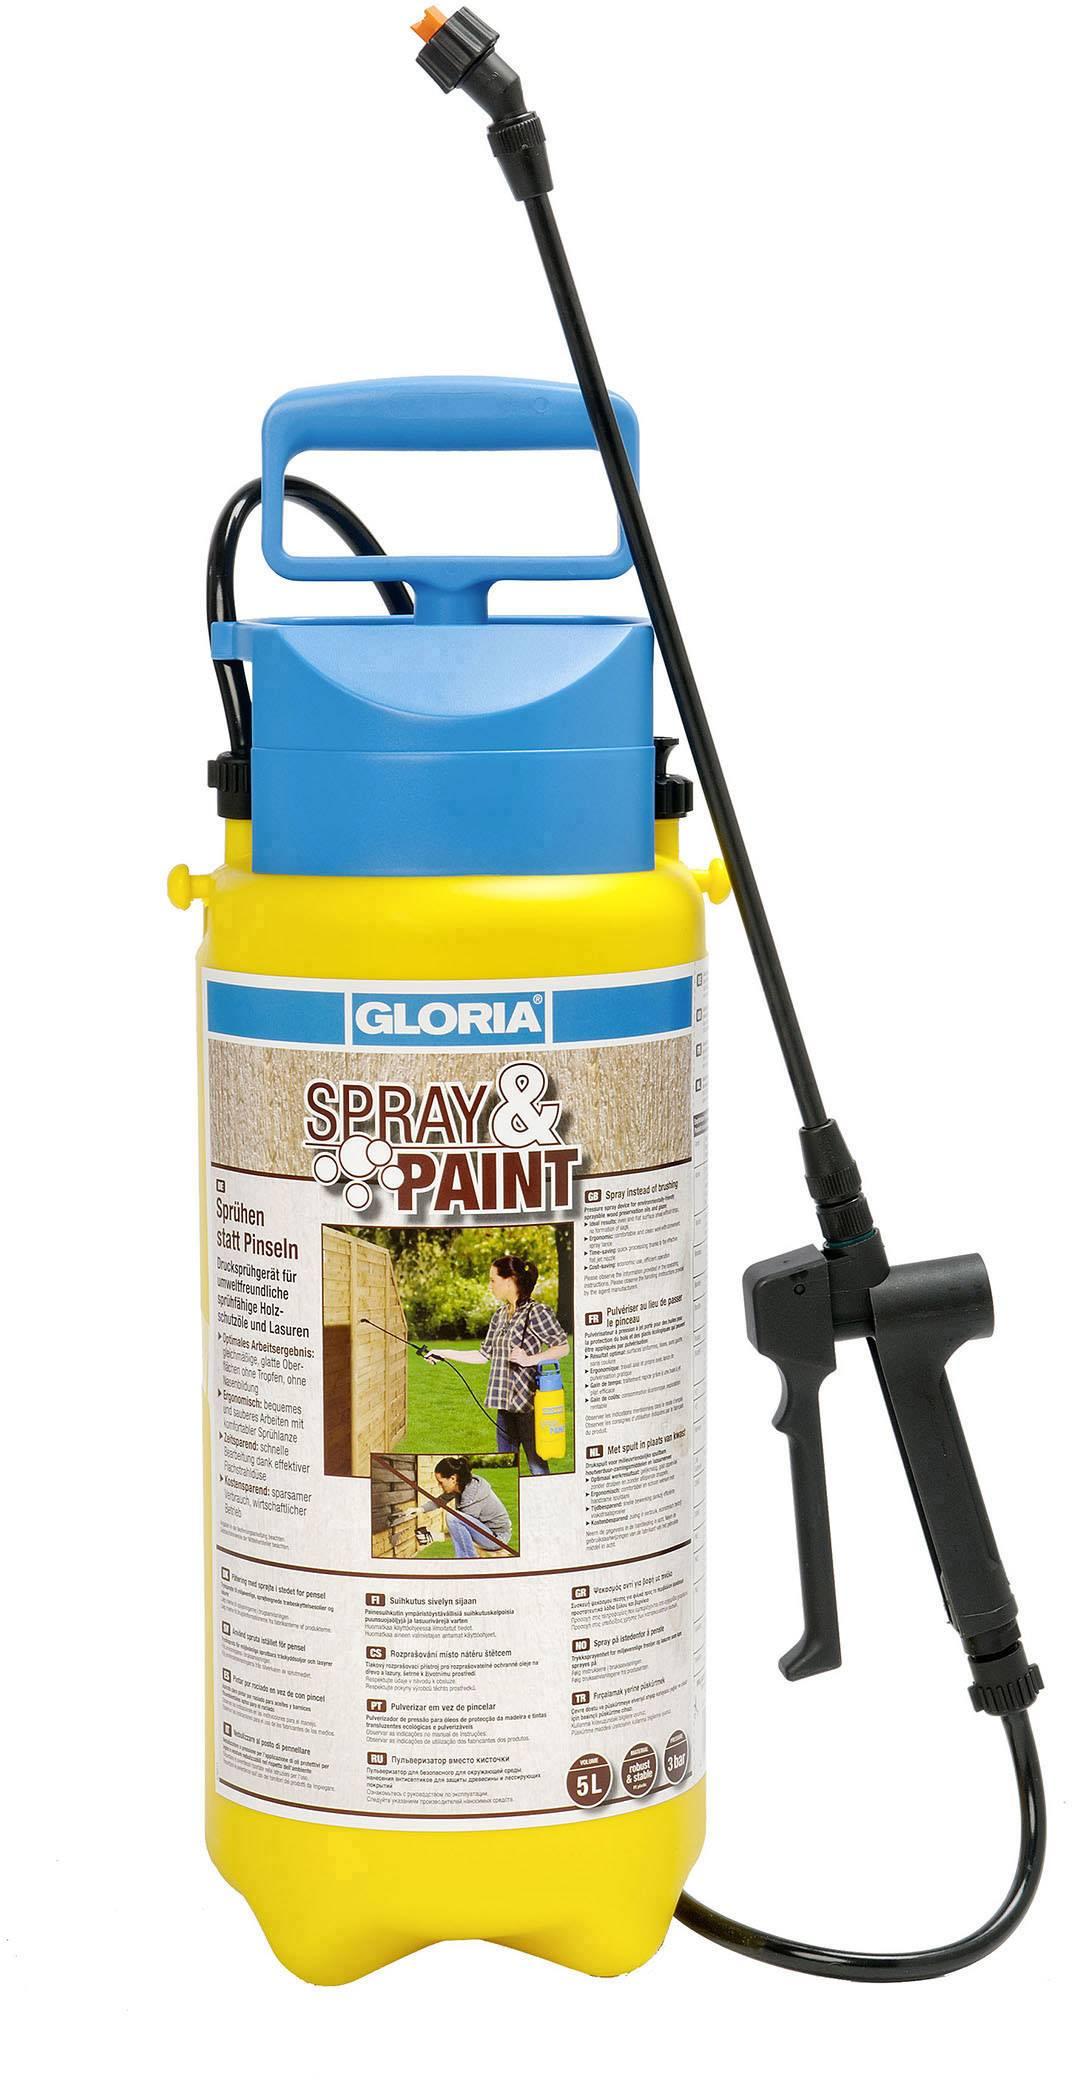 Tlakový rozprašovač Gloria Haus und Garten 000101.0000, Spray & Paint 5L, 5 l